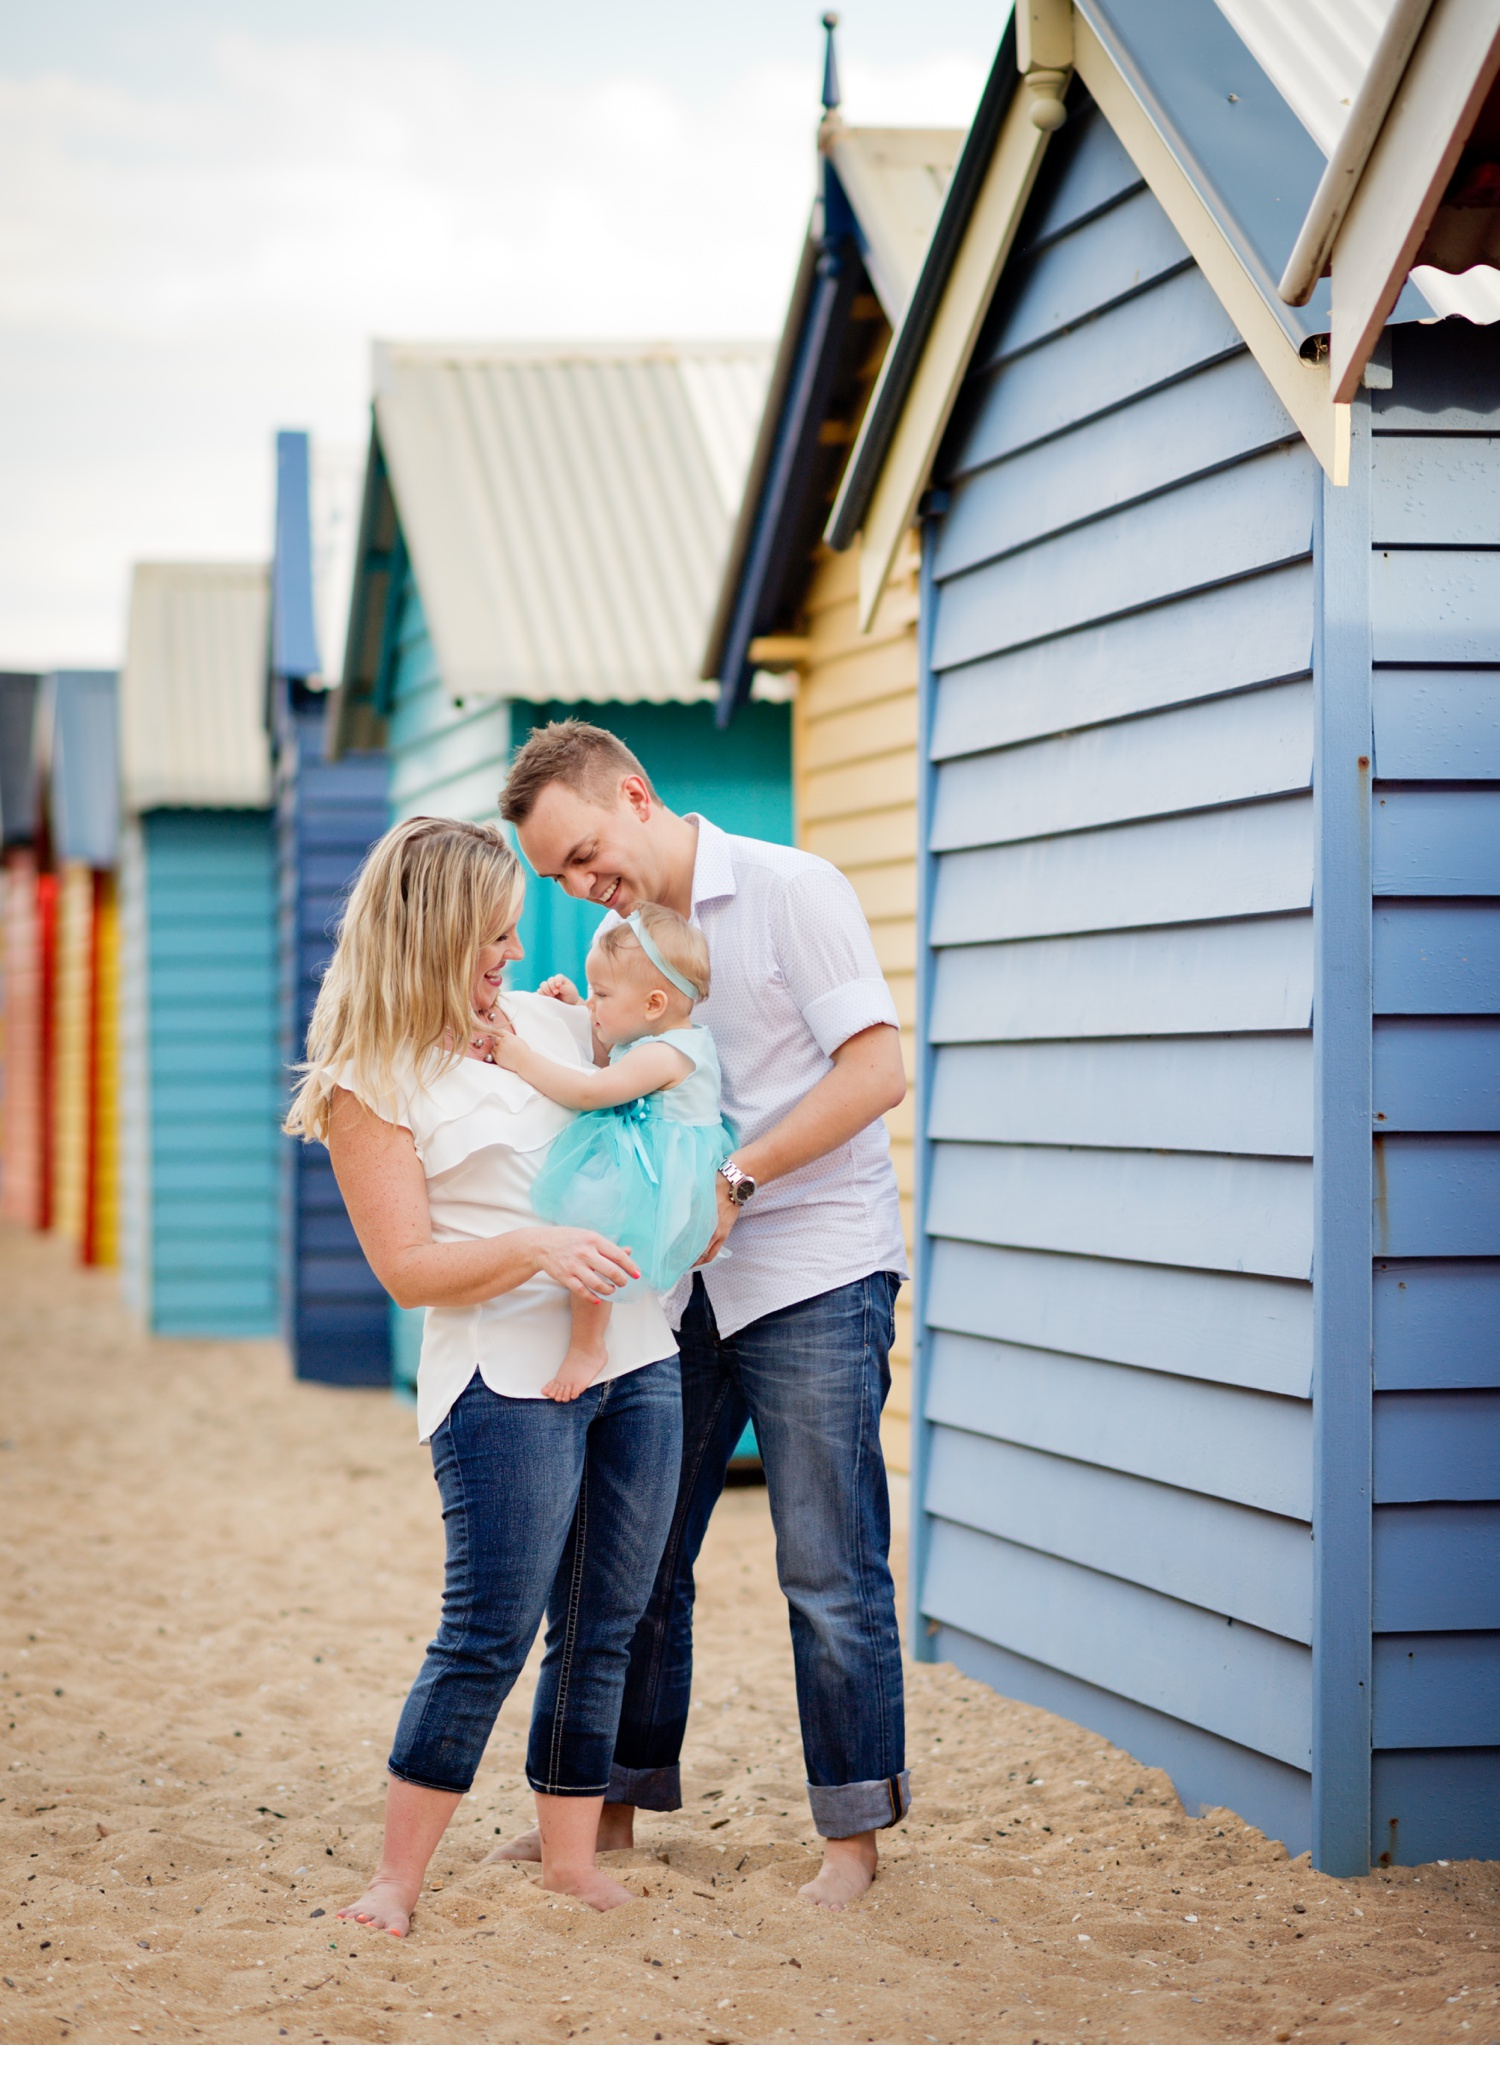 family-lifestyle-photography-brighton-beach22.jpg